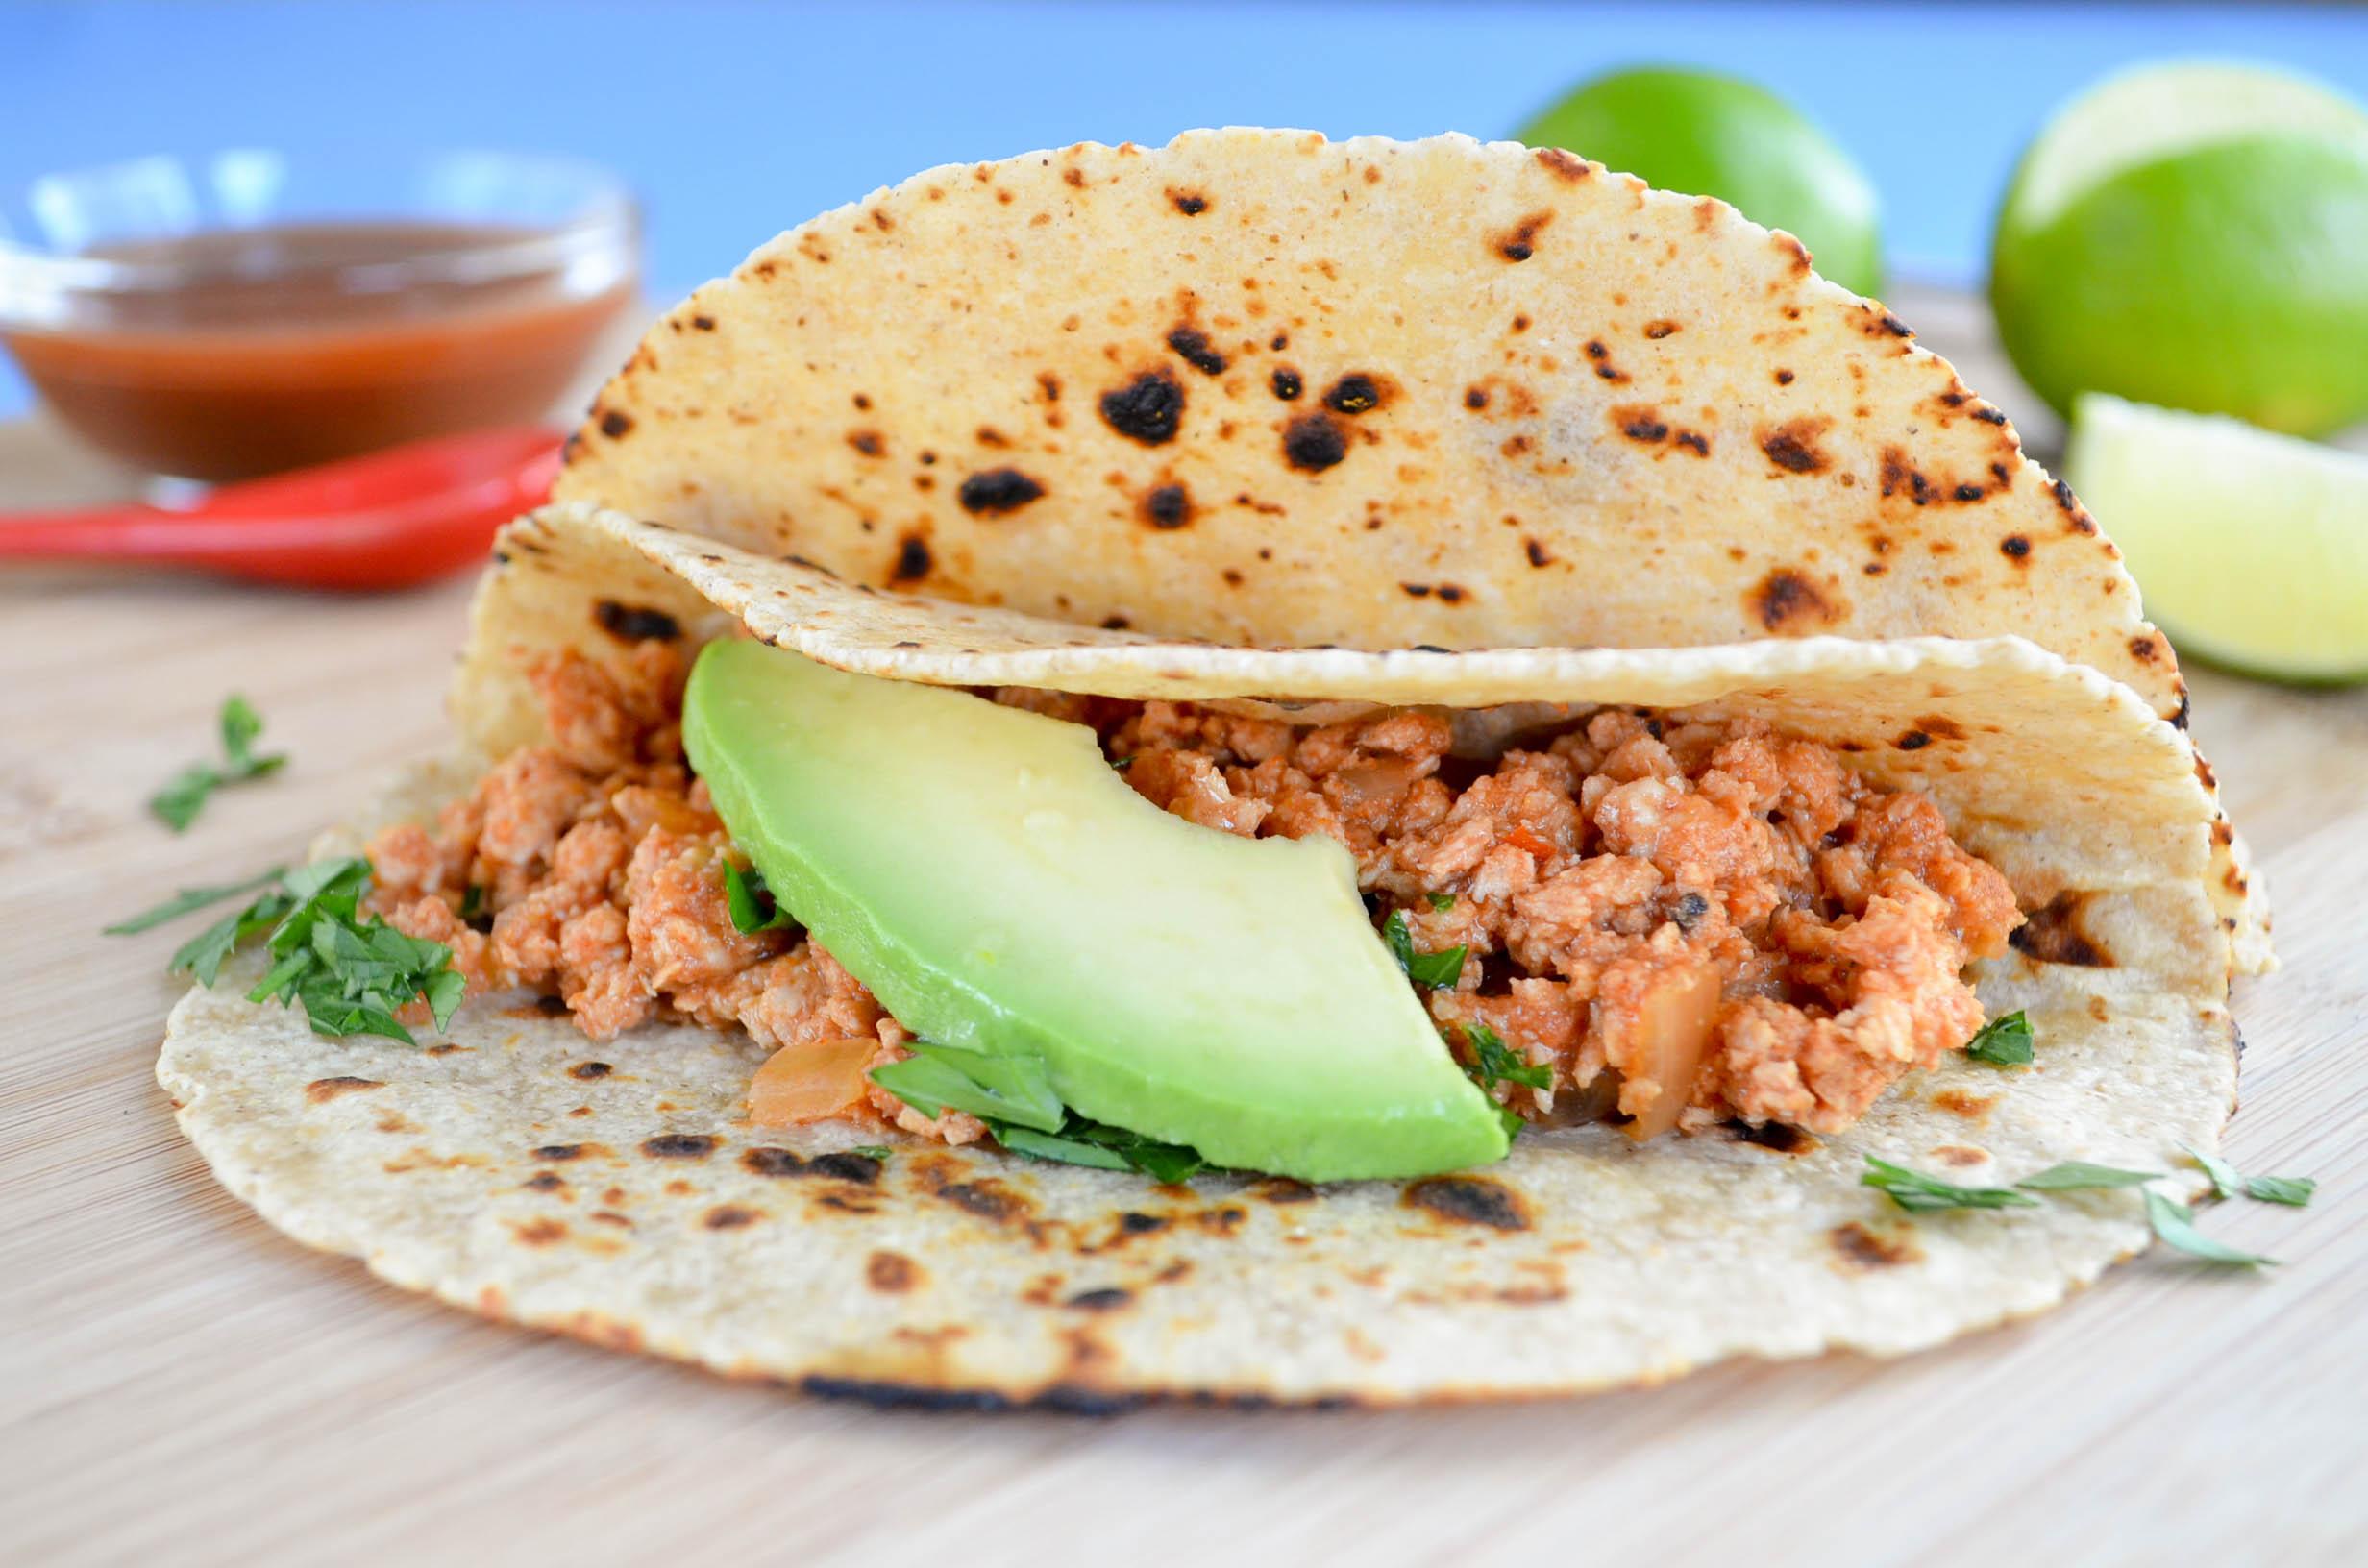 Slow Cooker Turkey Tacos